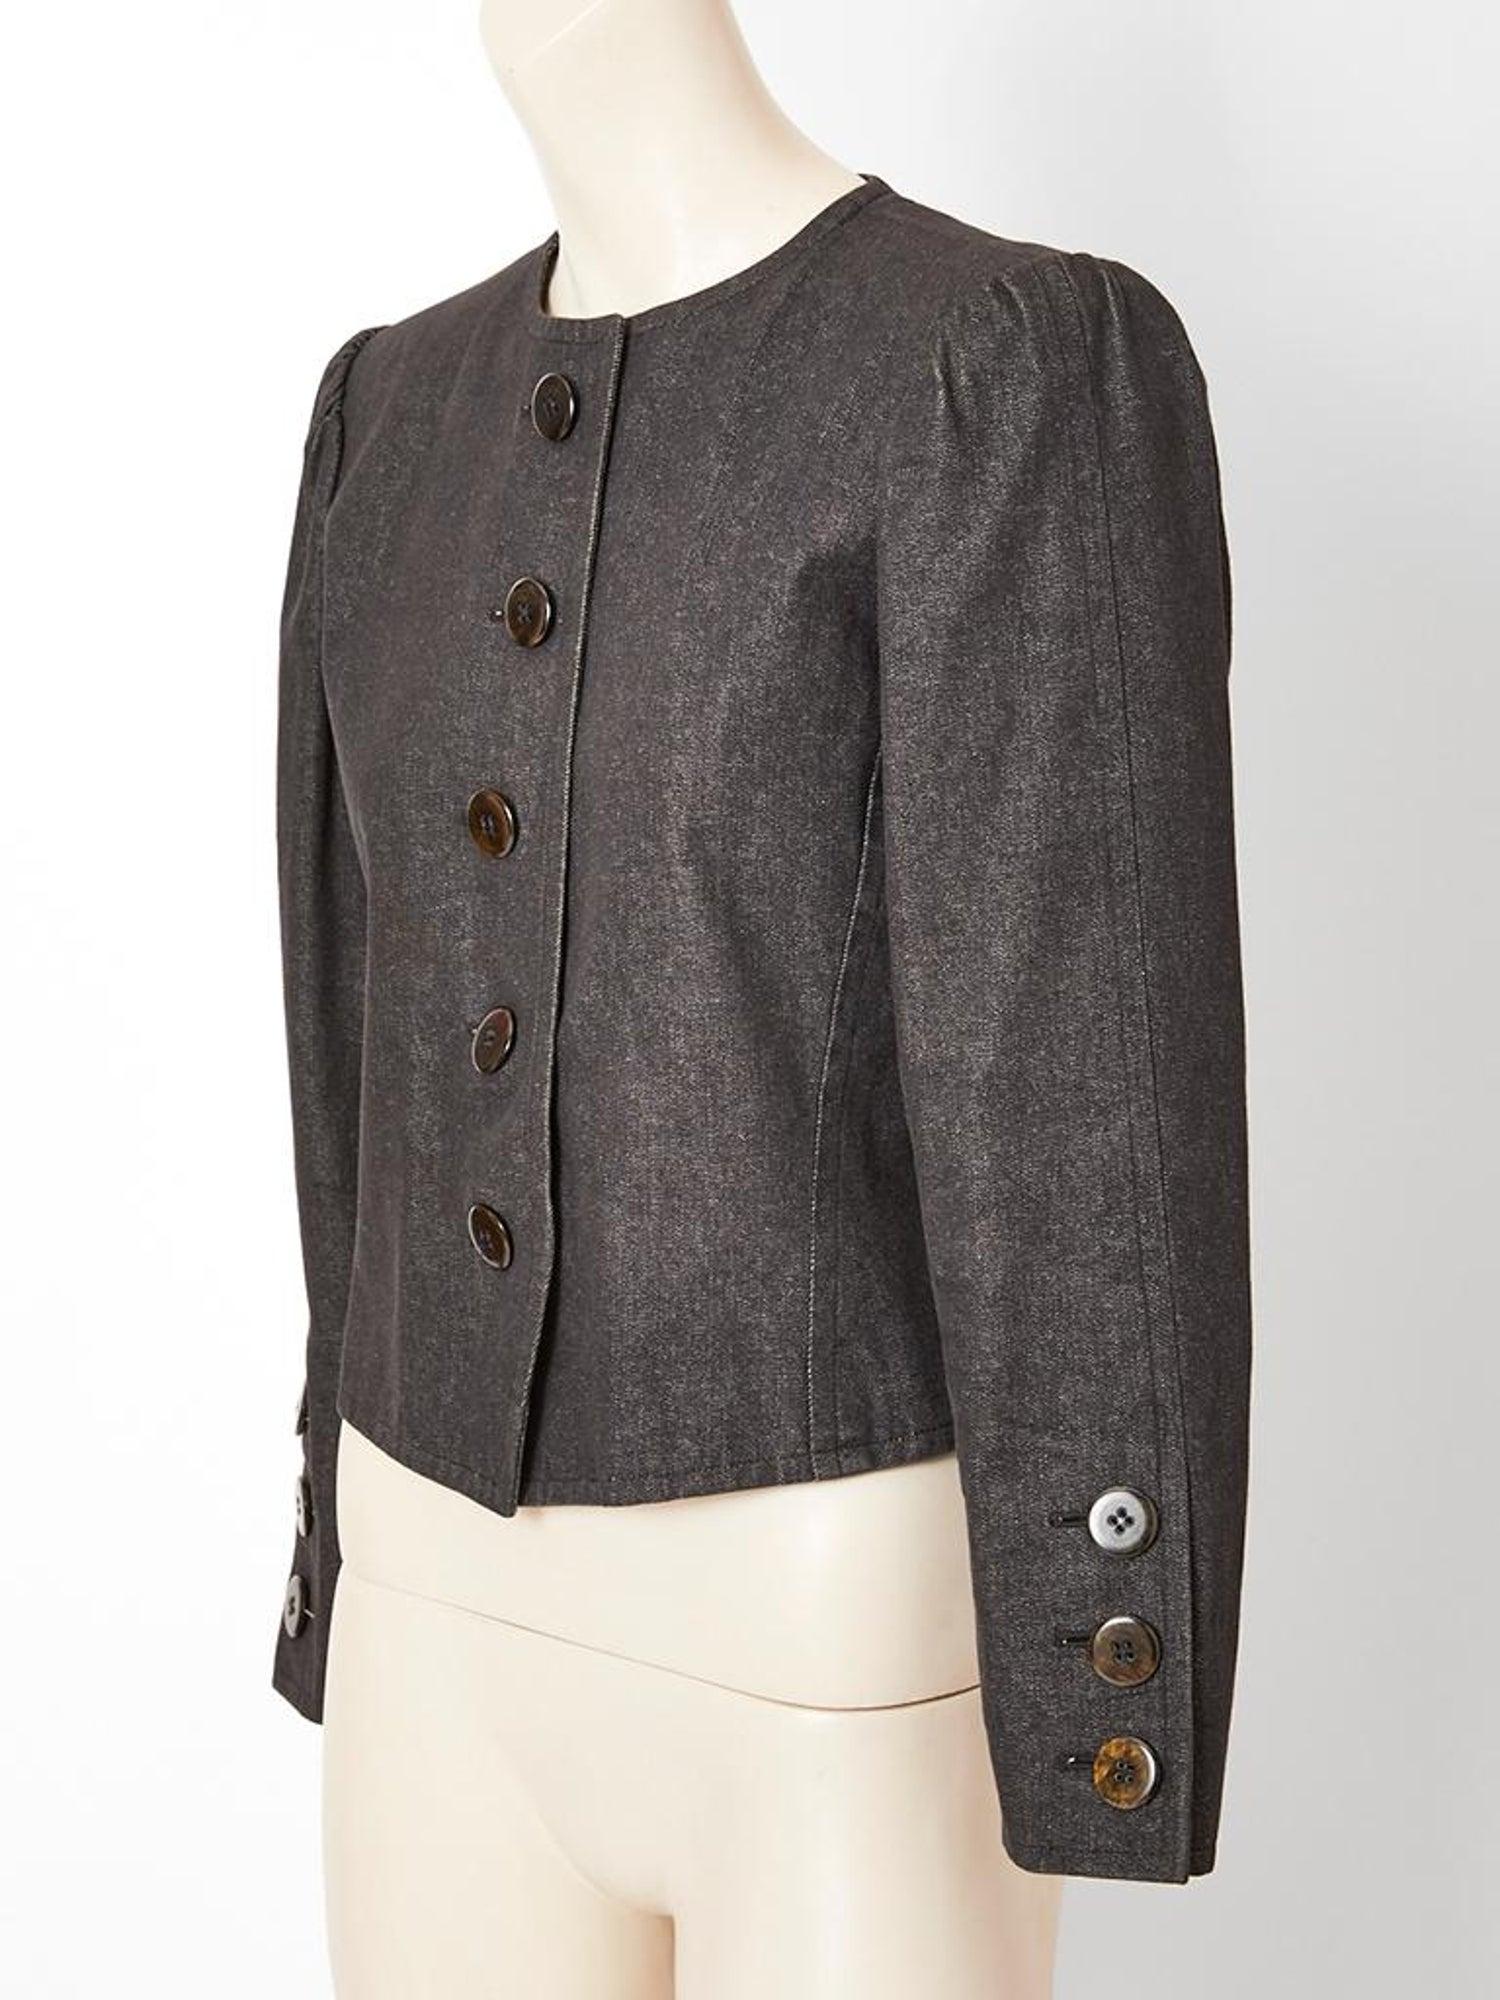 94bbc4525ed Yves Saint Laurent Rive Gauche Cropped Denim Jacket For Sale at 1stdibs